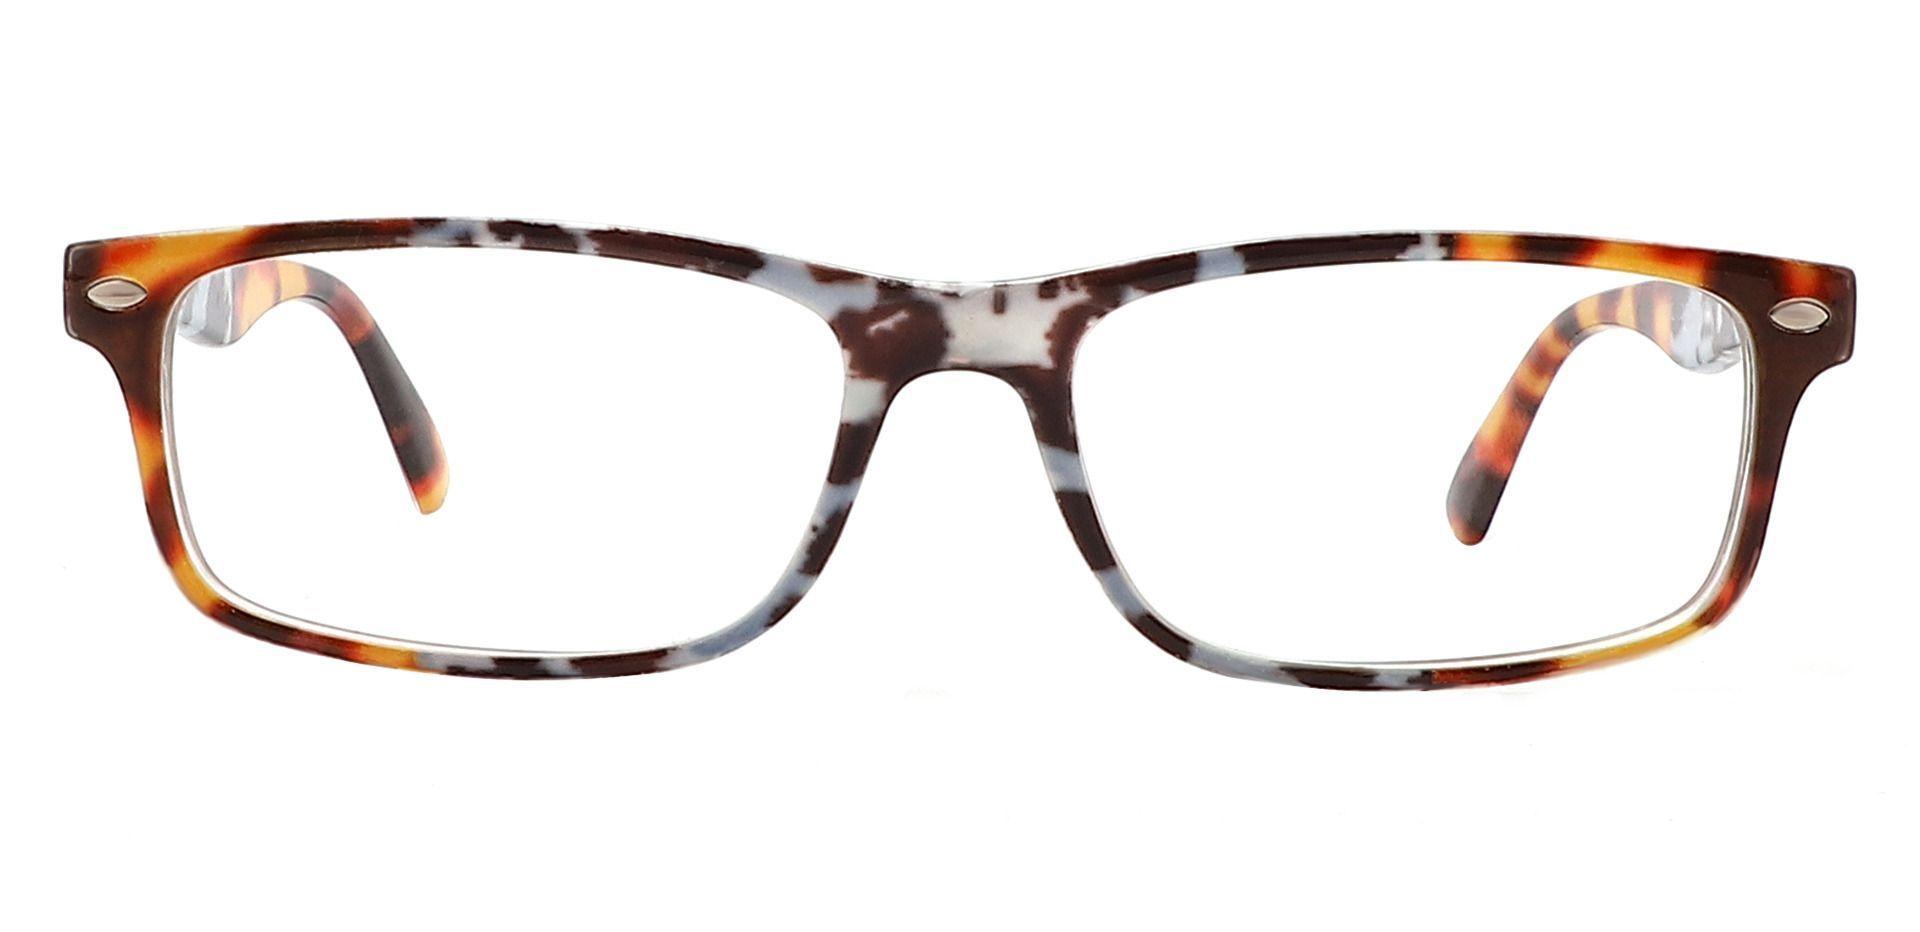 Elfrida Rectangle Lined Bifocal Glasses - Tortoise